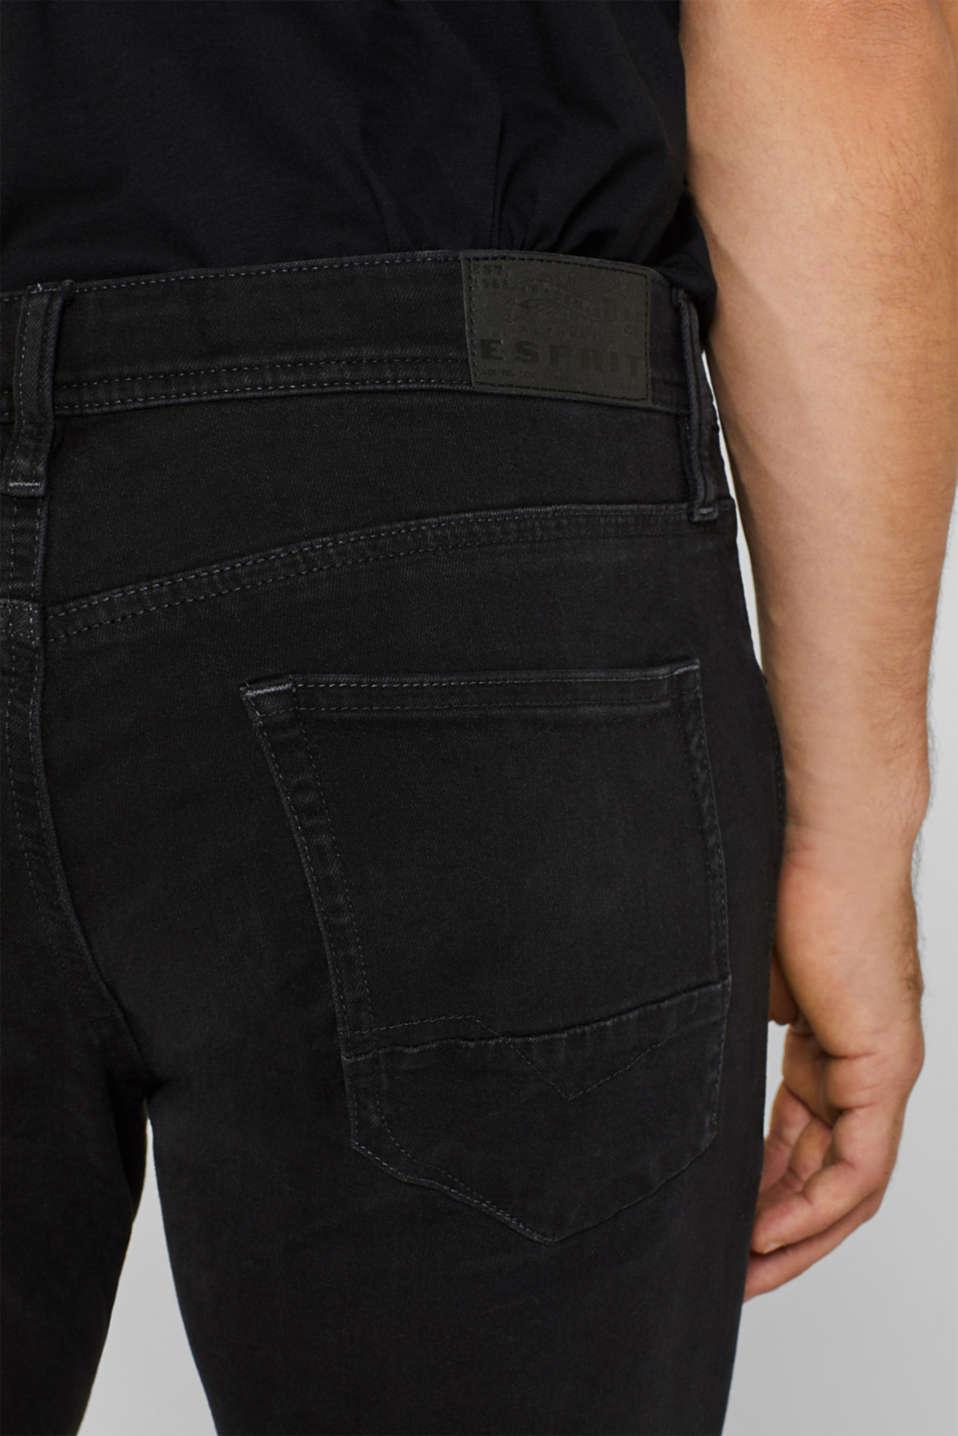 Pants denim, BLACK DARK WASH, detail image number 3